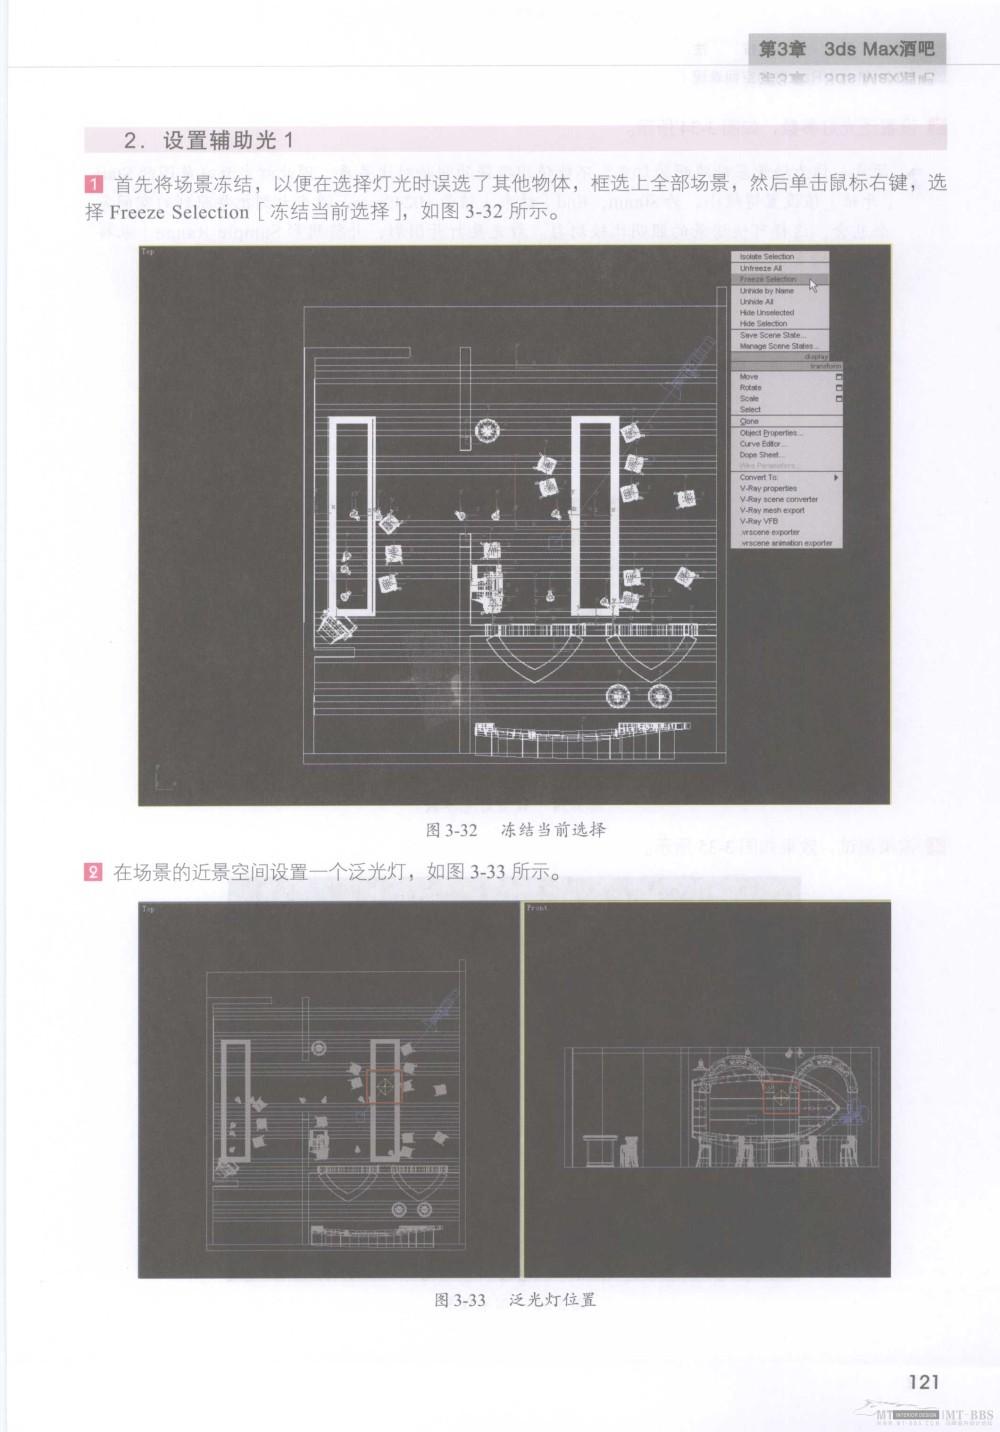 水晶石技法-3ds_Max&VRay室内空间表现_水晶石技法-3ds_Max&VRay室内空间表现_页面_127.jpg